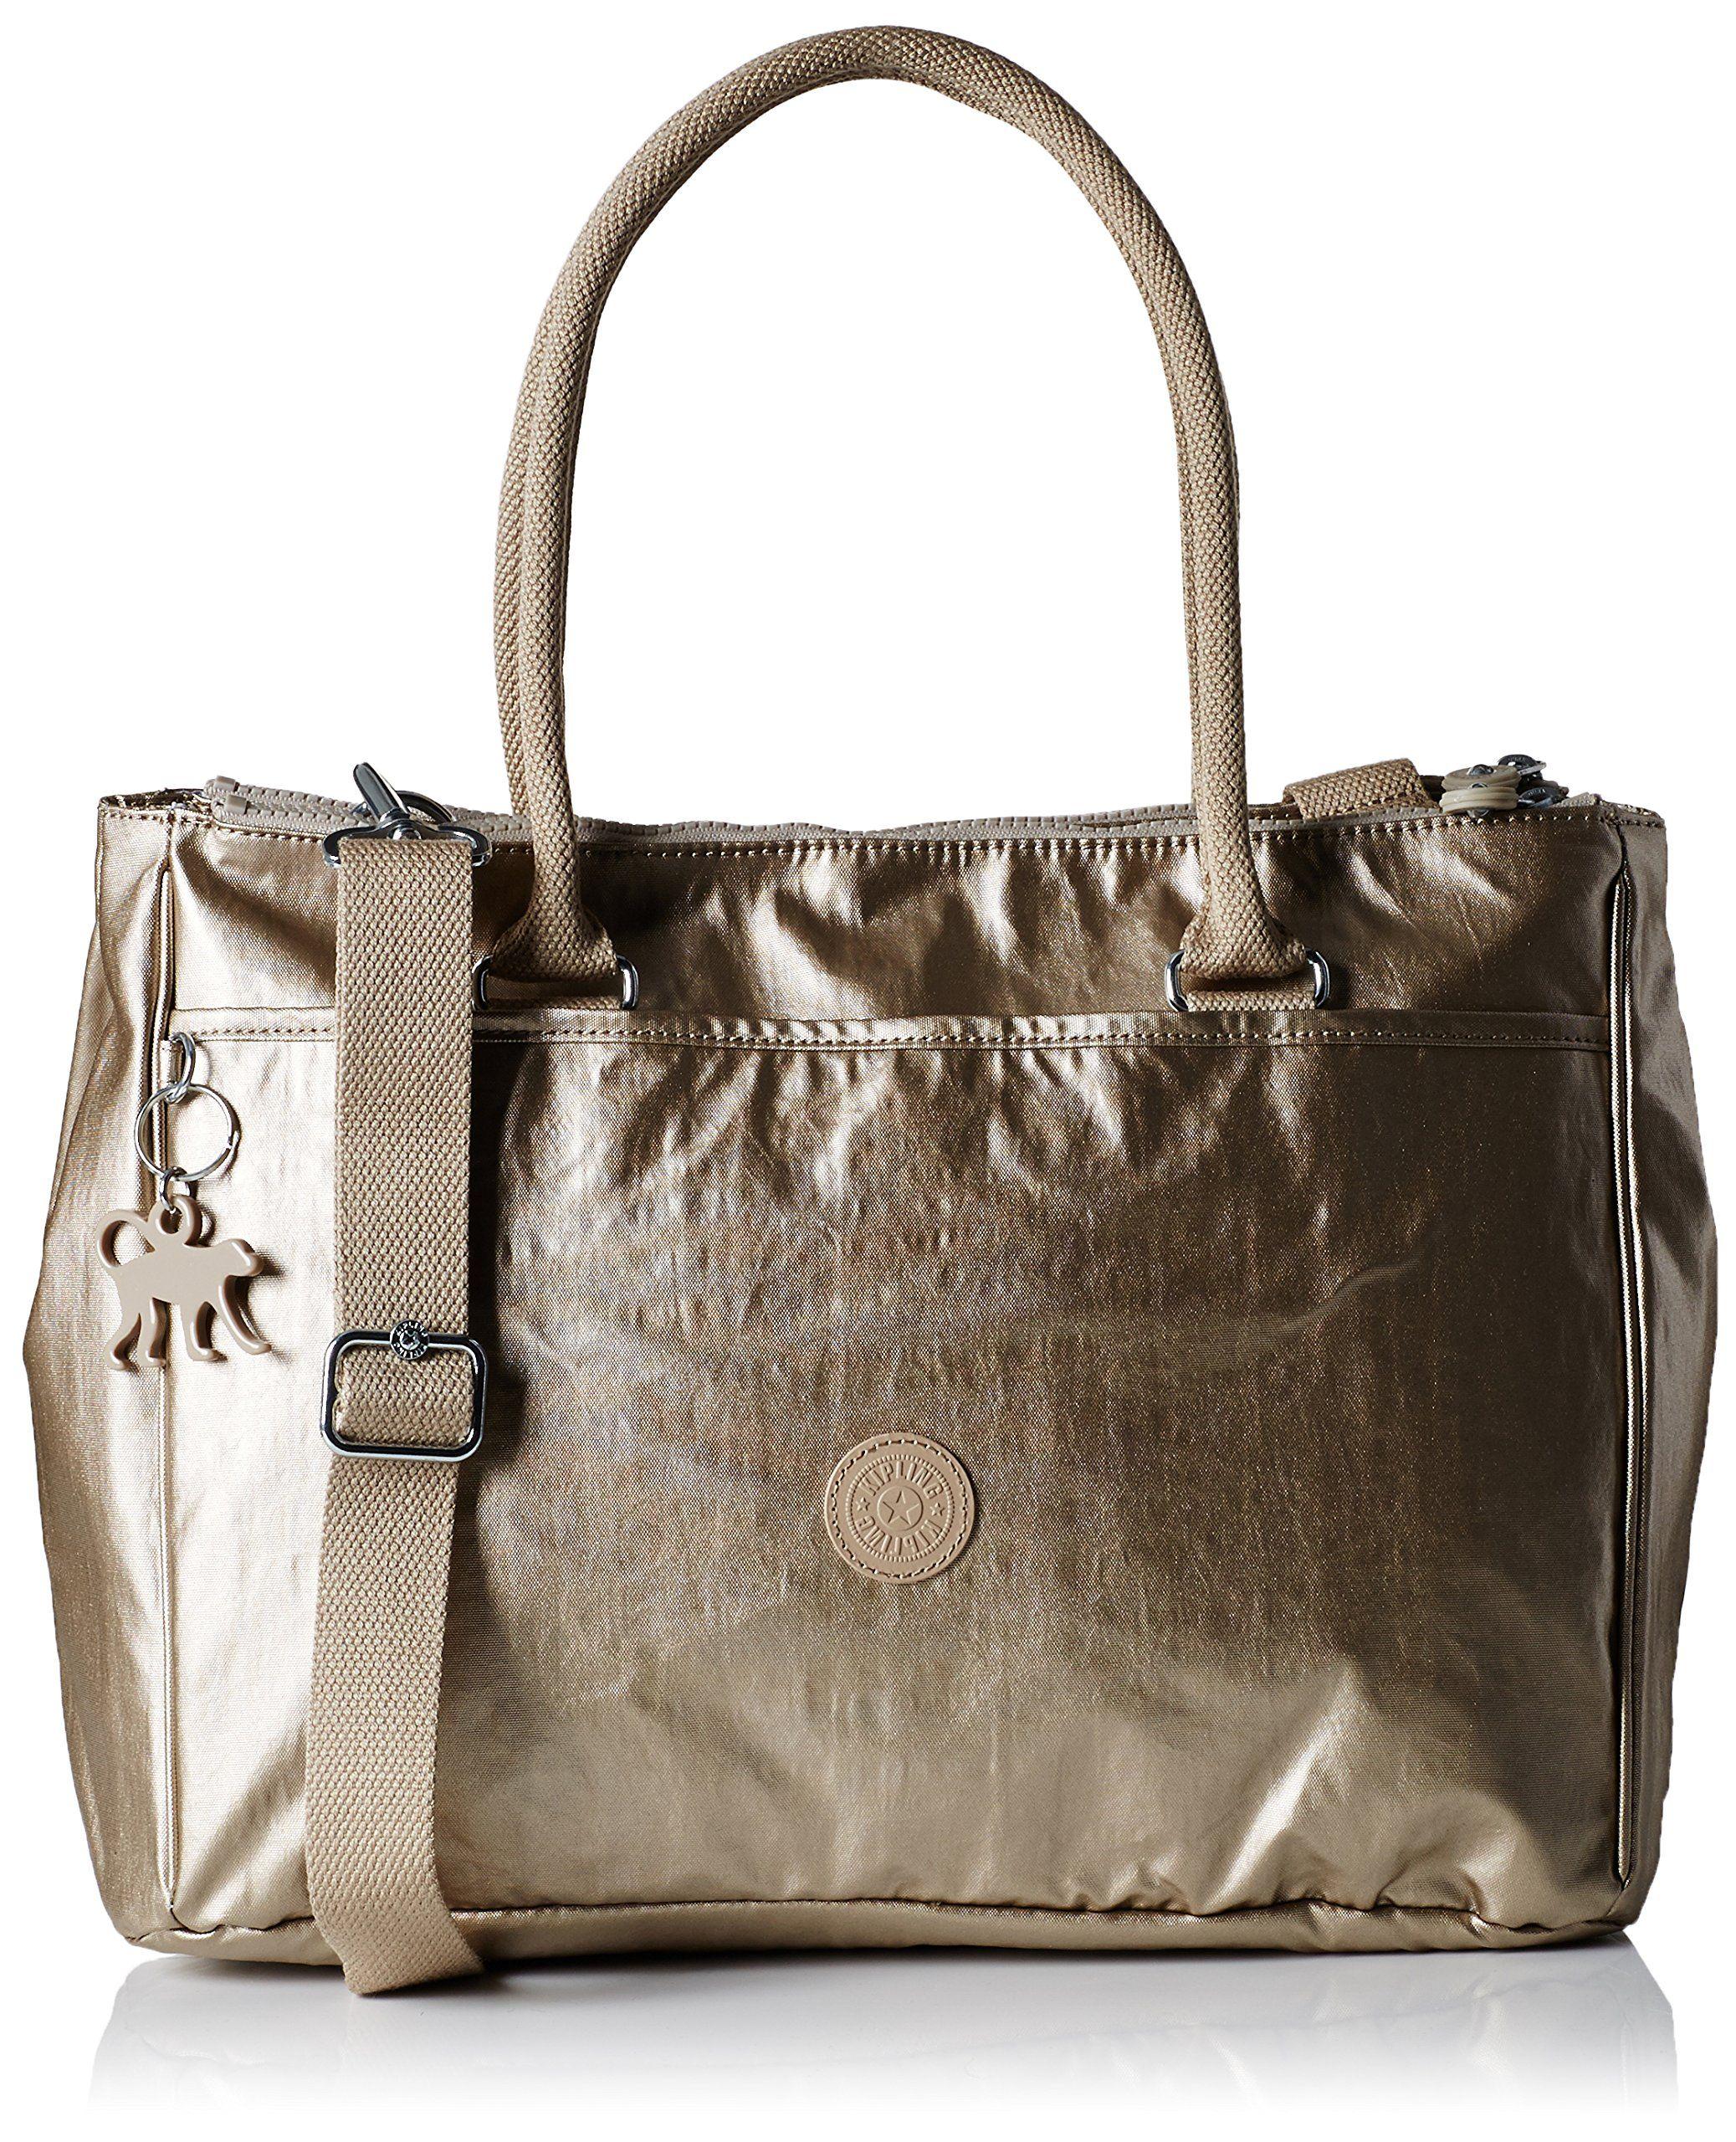 Champagne Halia Bag Bp MetalBolsos New Shoulder Kipling Womens 1TFKJcl